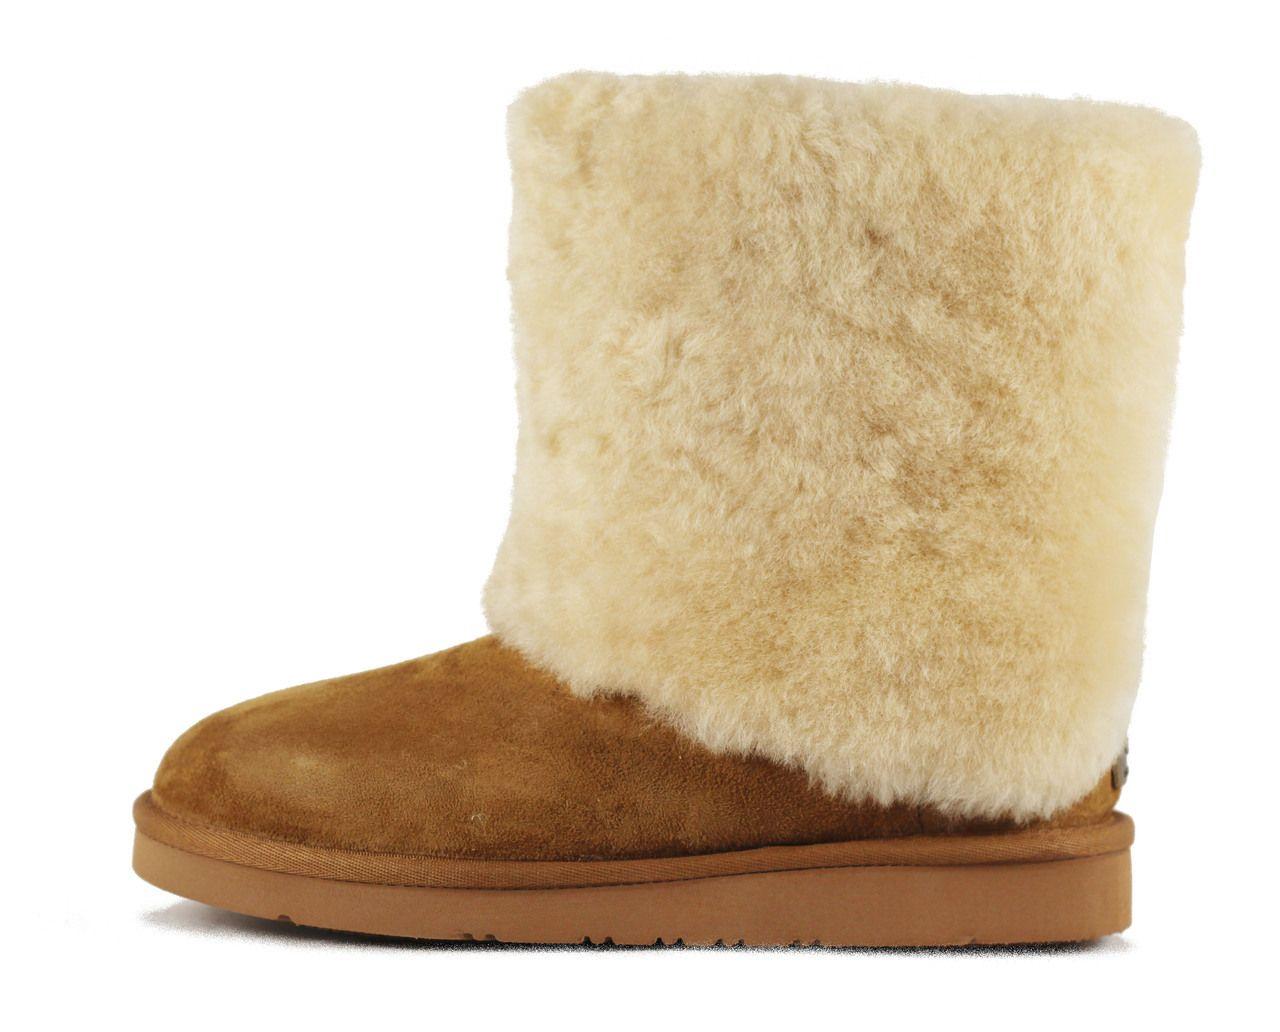 c9e7ffb4e58 UGG Australia for Women: Patten Chestnut Ankle Boot Wheat in 2019 ...